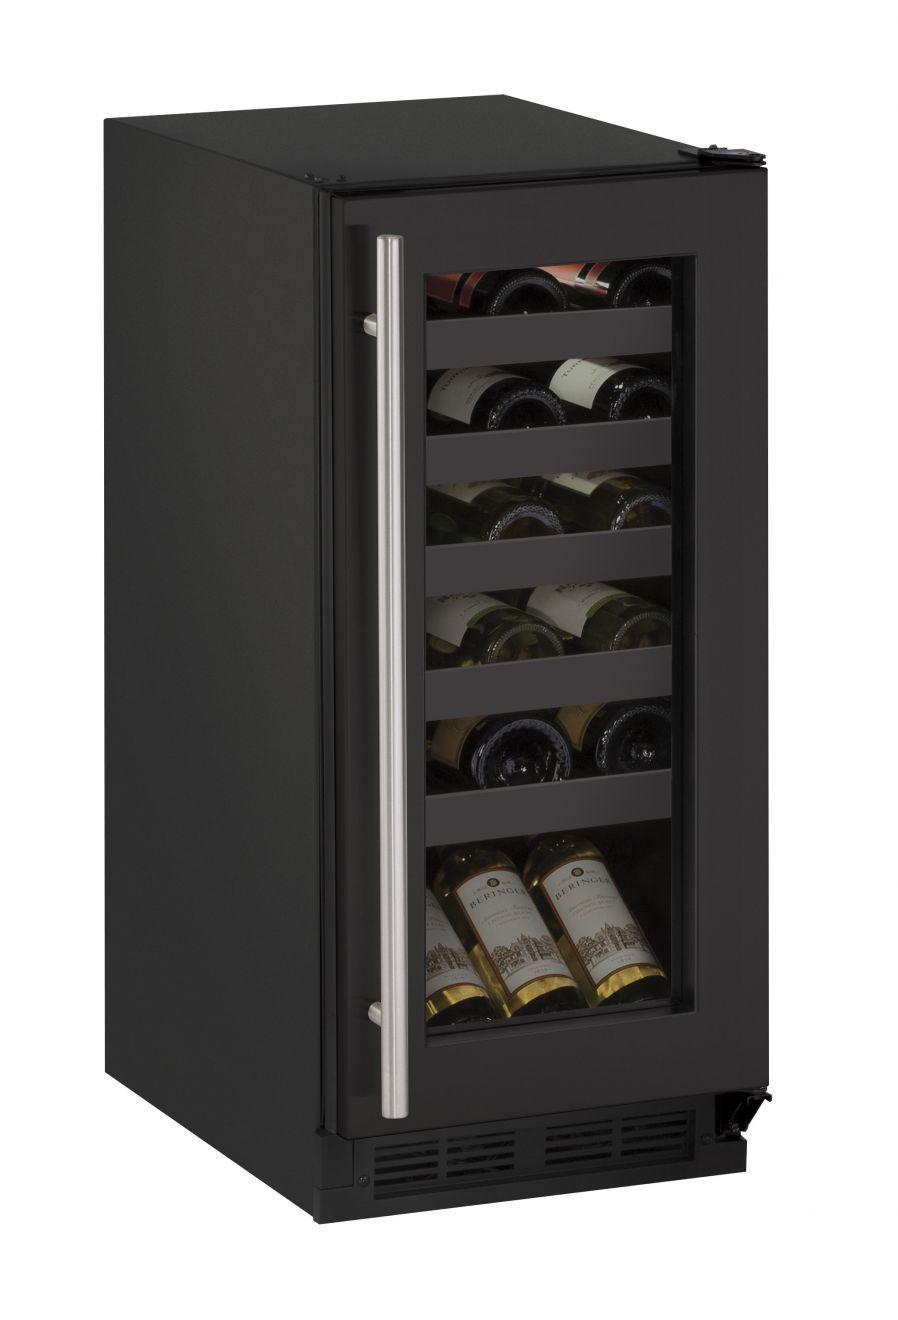 U-Line Specialty Refrigerators